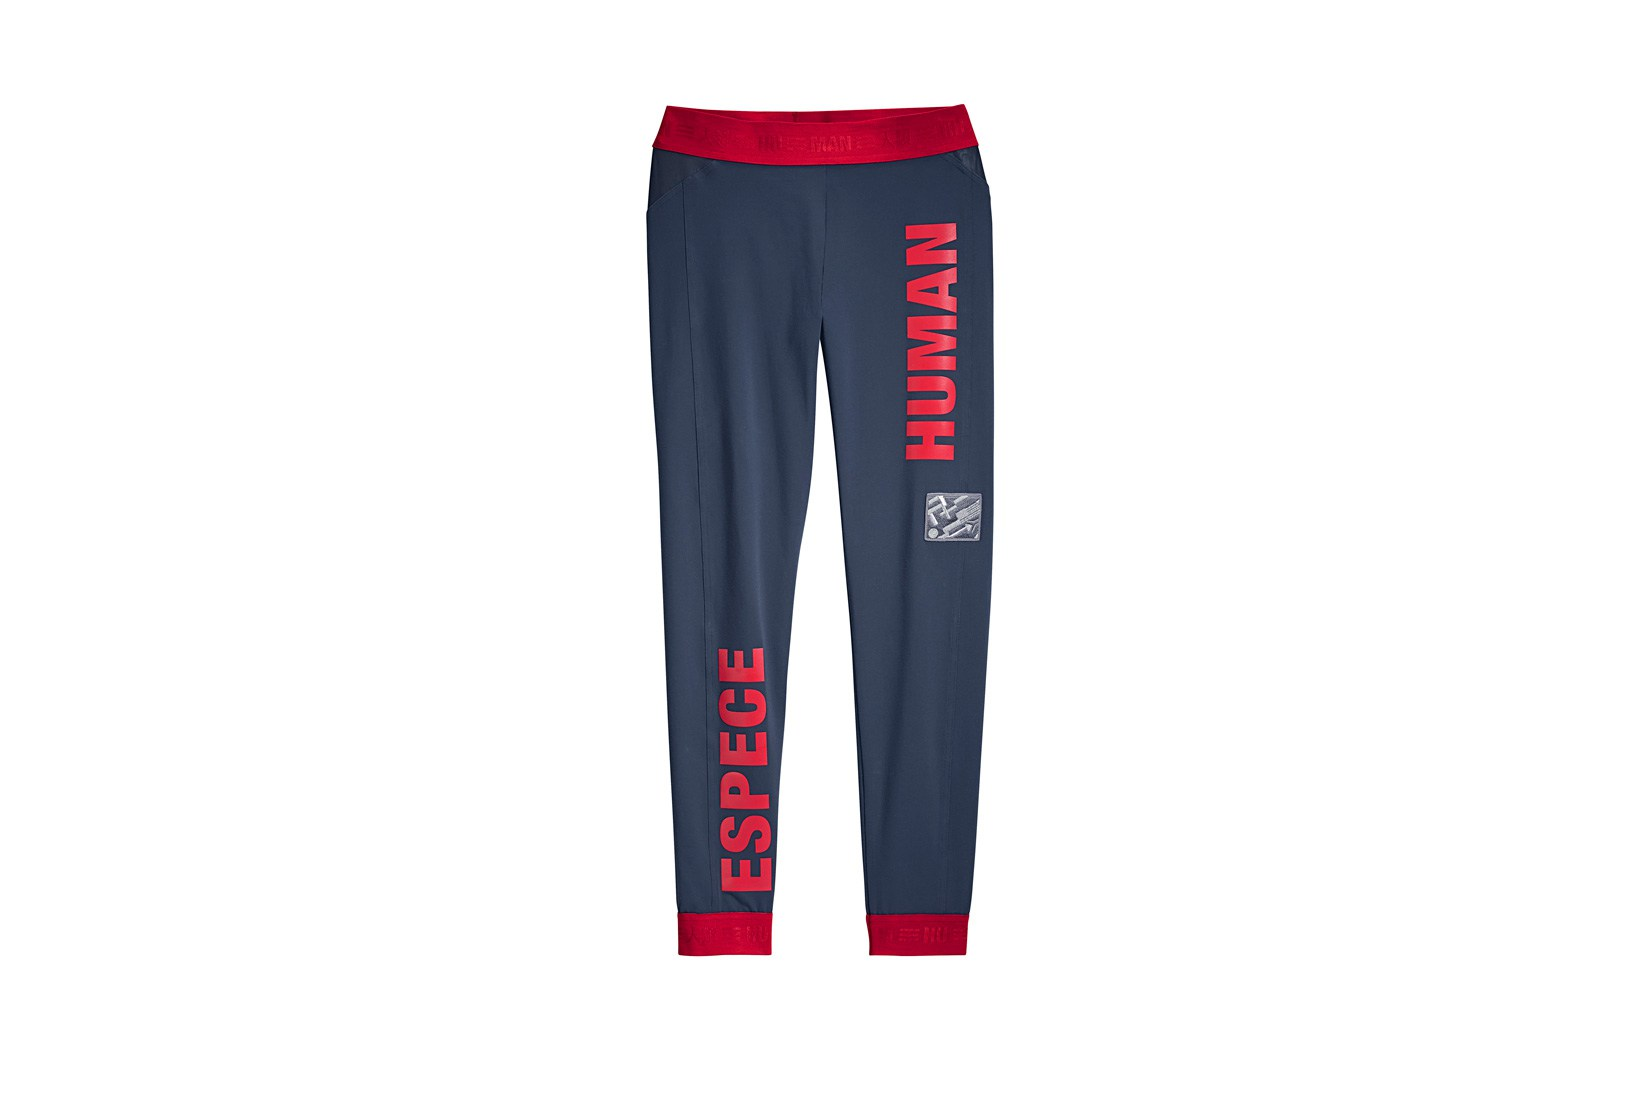 pharrell-williams-adidas-originals-hu-collection-11